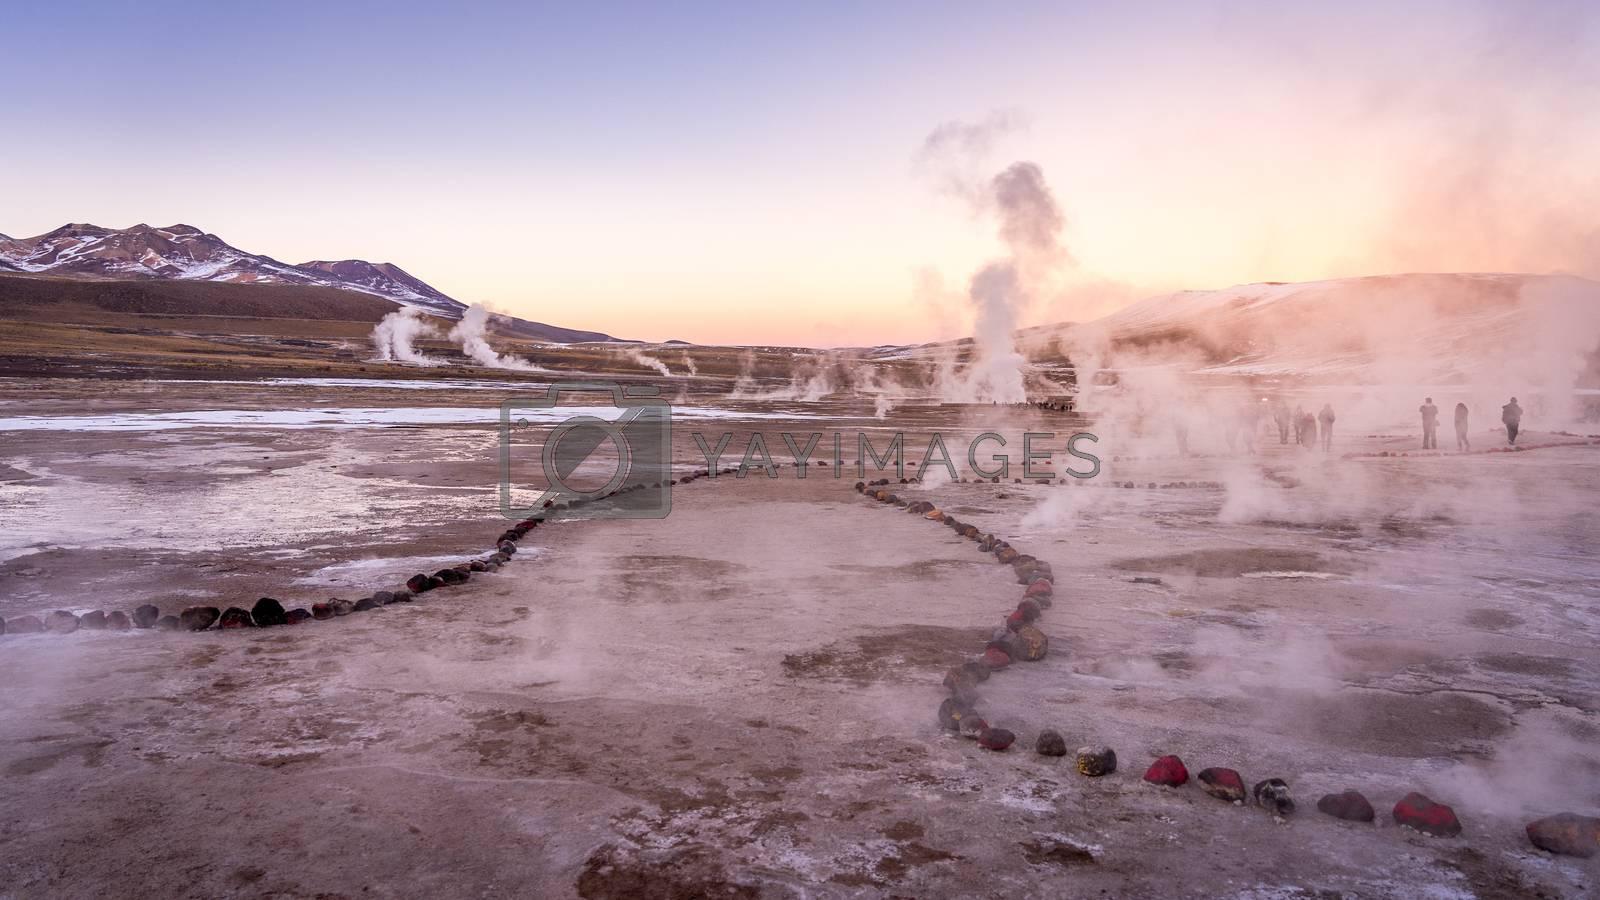 Royalty free image of Sunrise at Geyser El Tatio, San Pedro de Atacama, Chile. by maramade